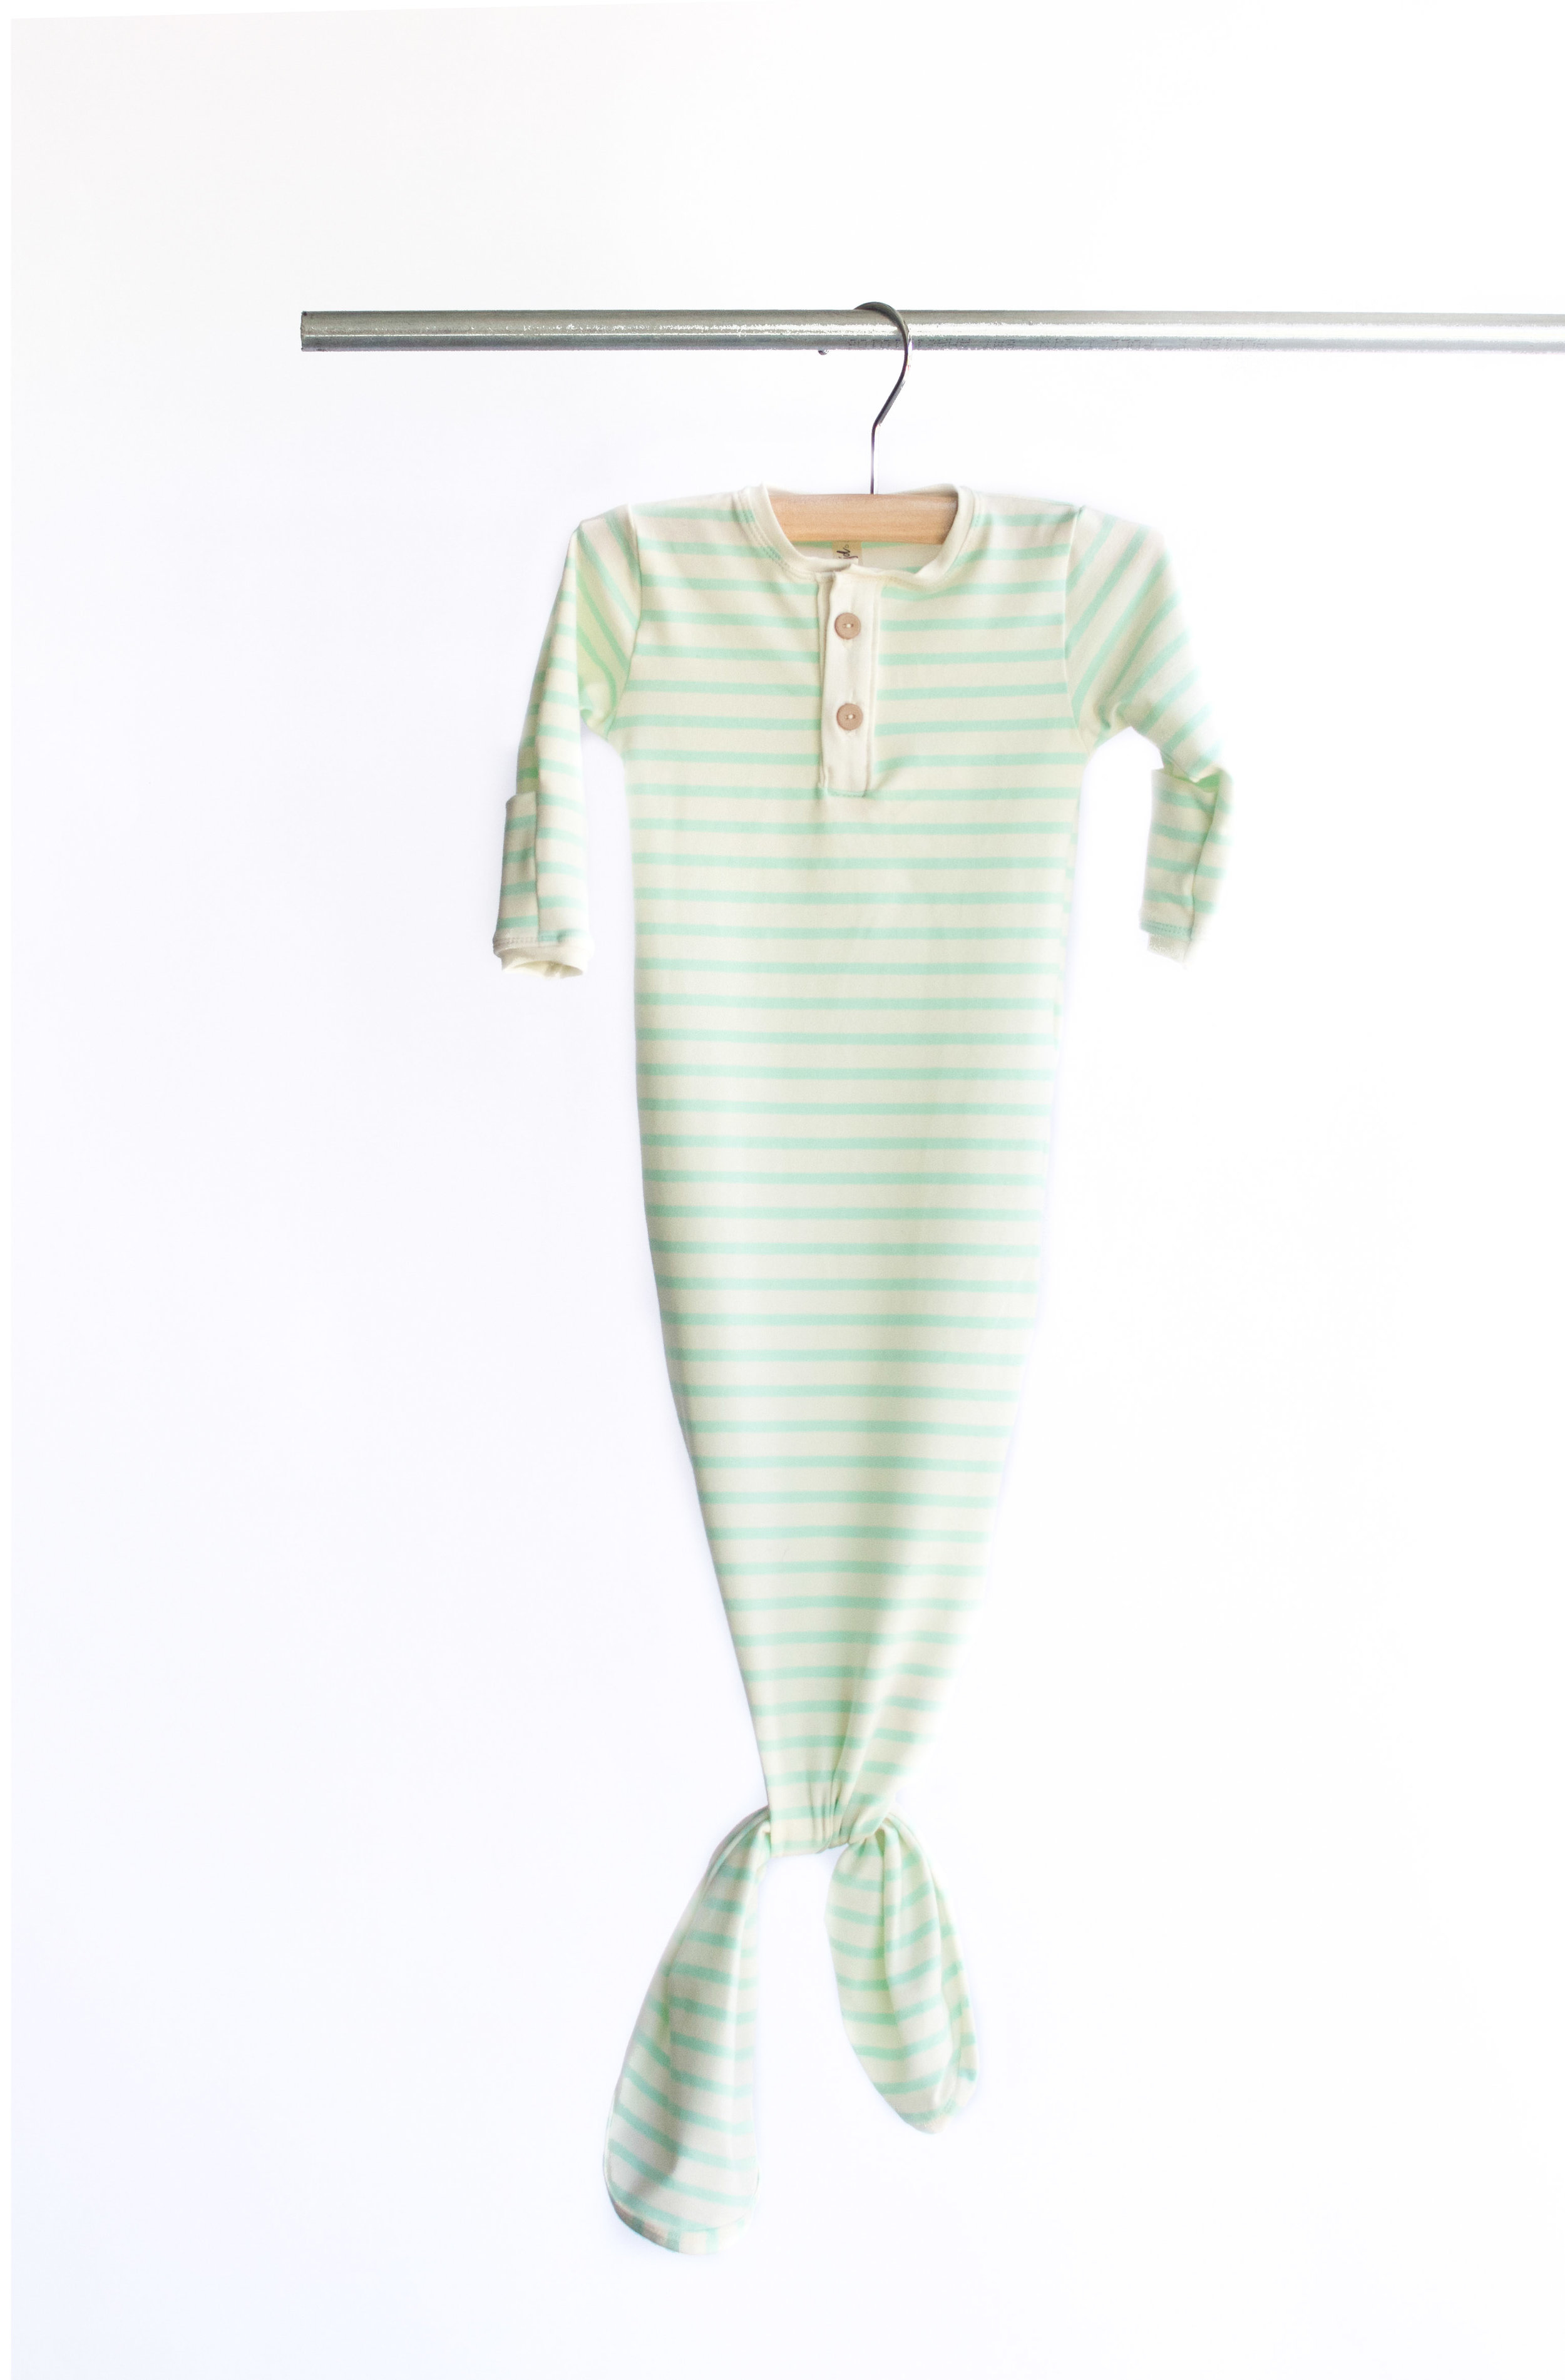 gown9.jpg